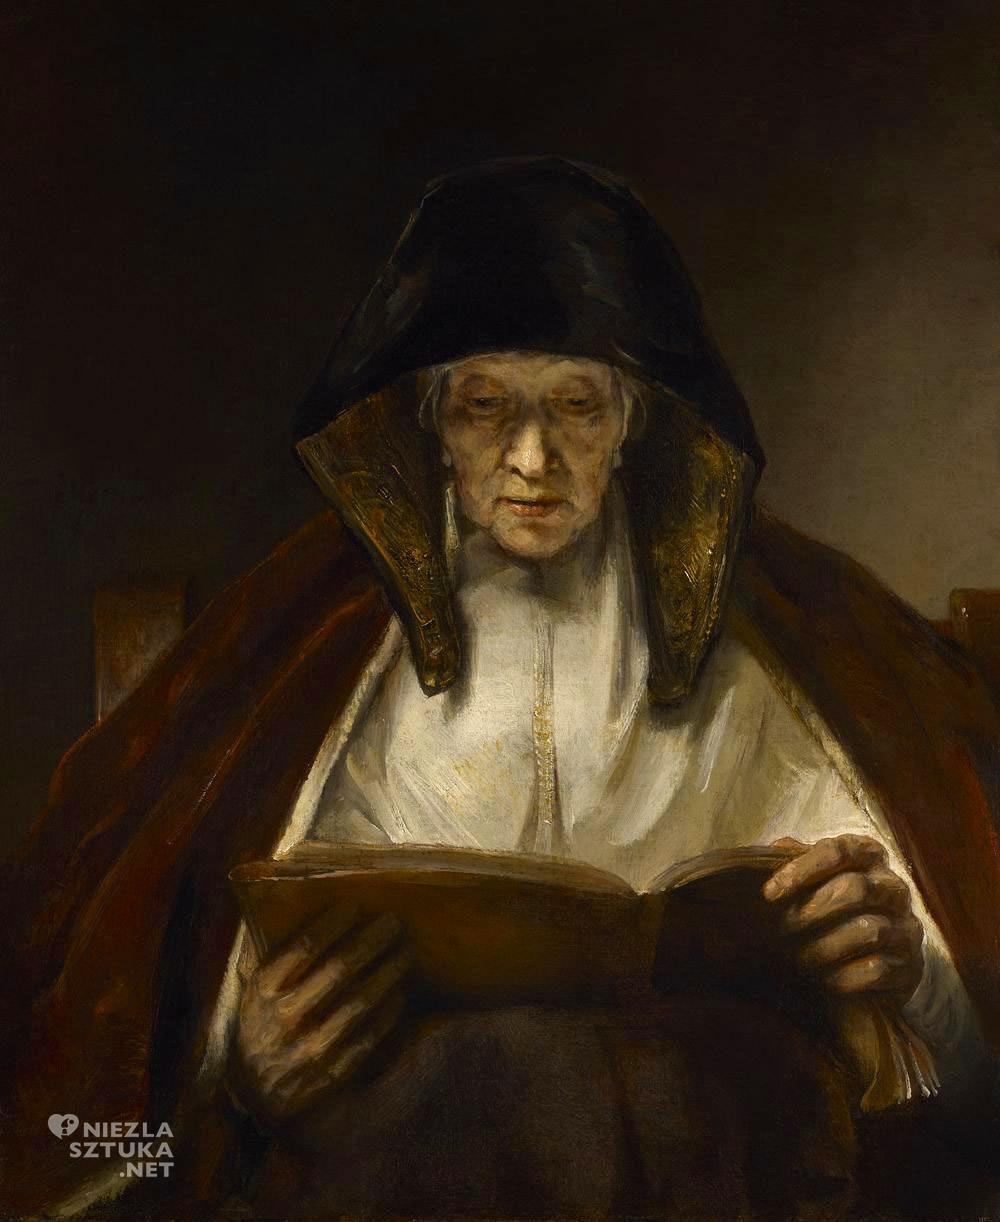 Rembrandt, Rembrandt van Rijn, Stara kobieta czytająca, sztuka niderlandzka, malarstwo niderlandzkie, Niezła Sztuka